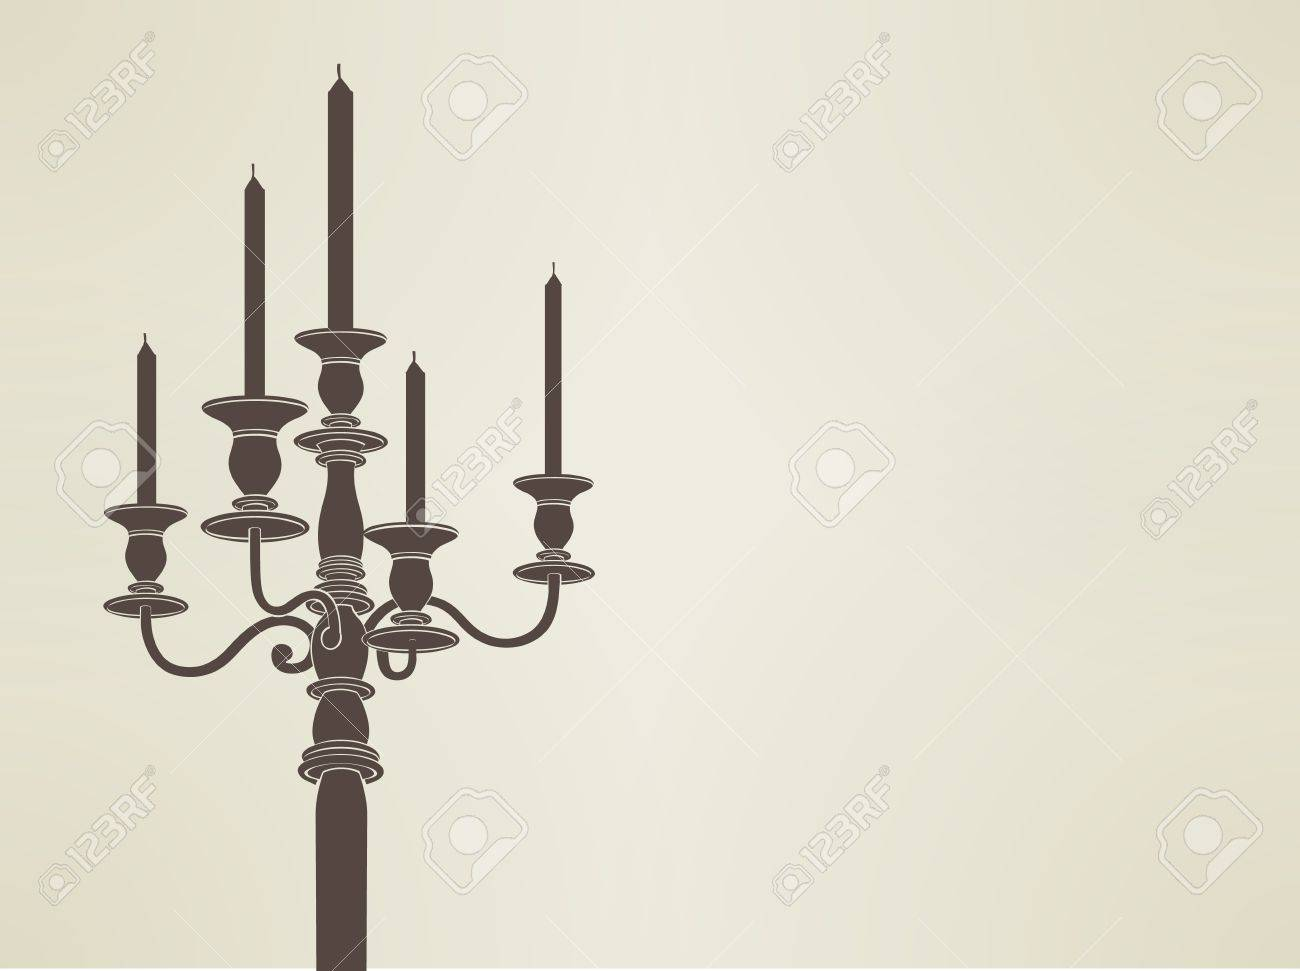 candelabra silhouette Stock Vector - 19977735